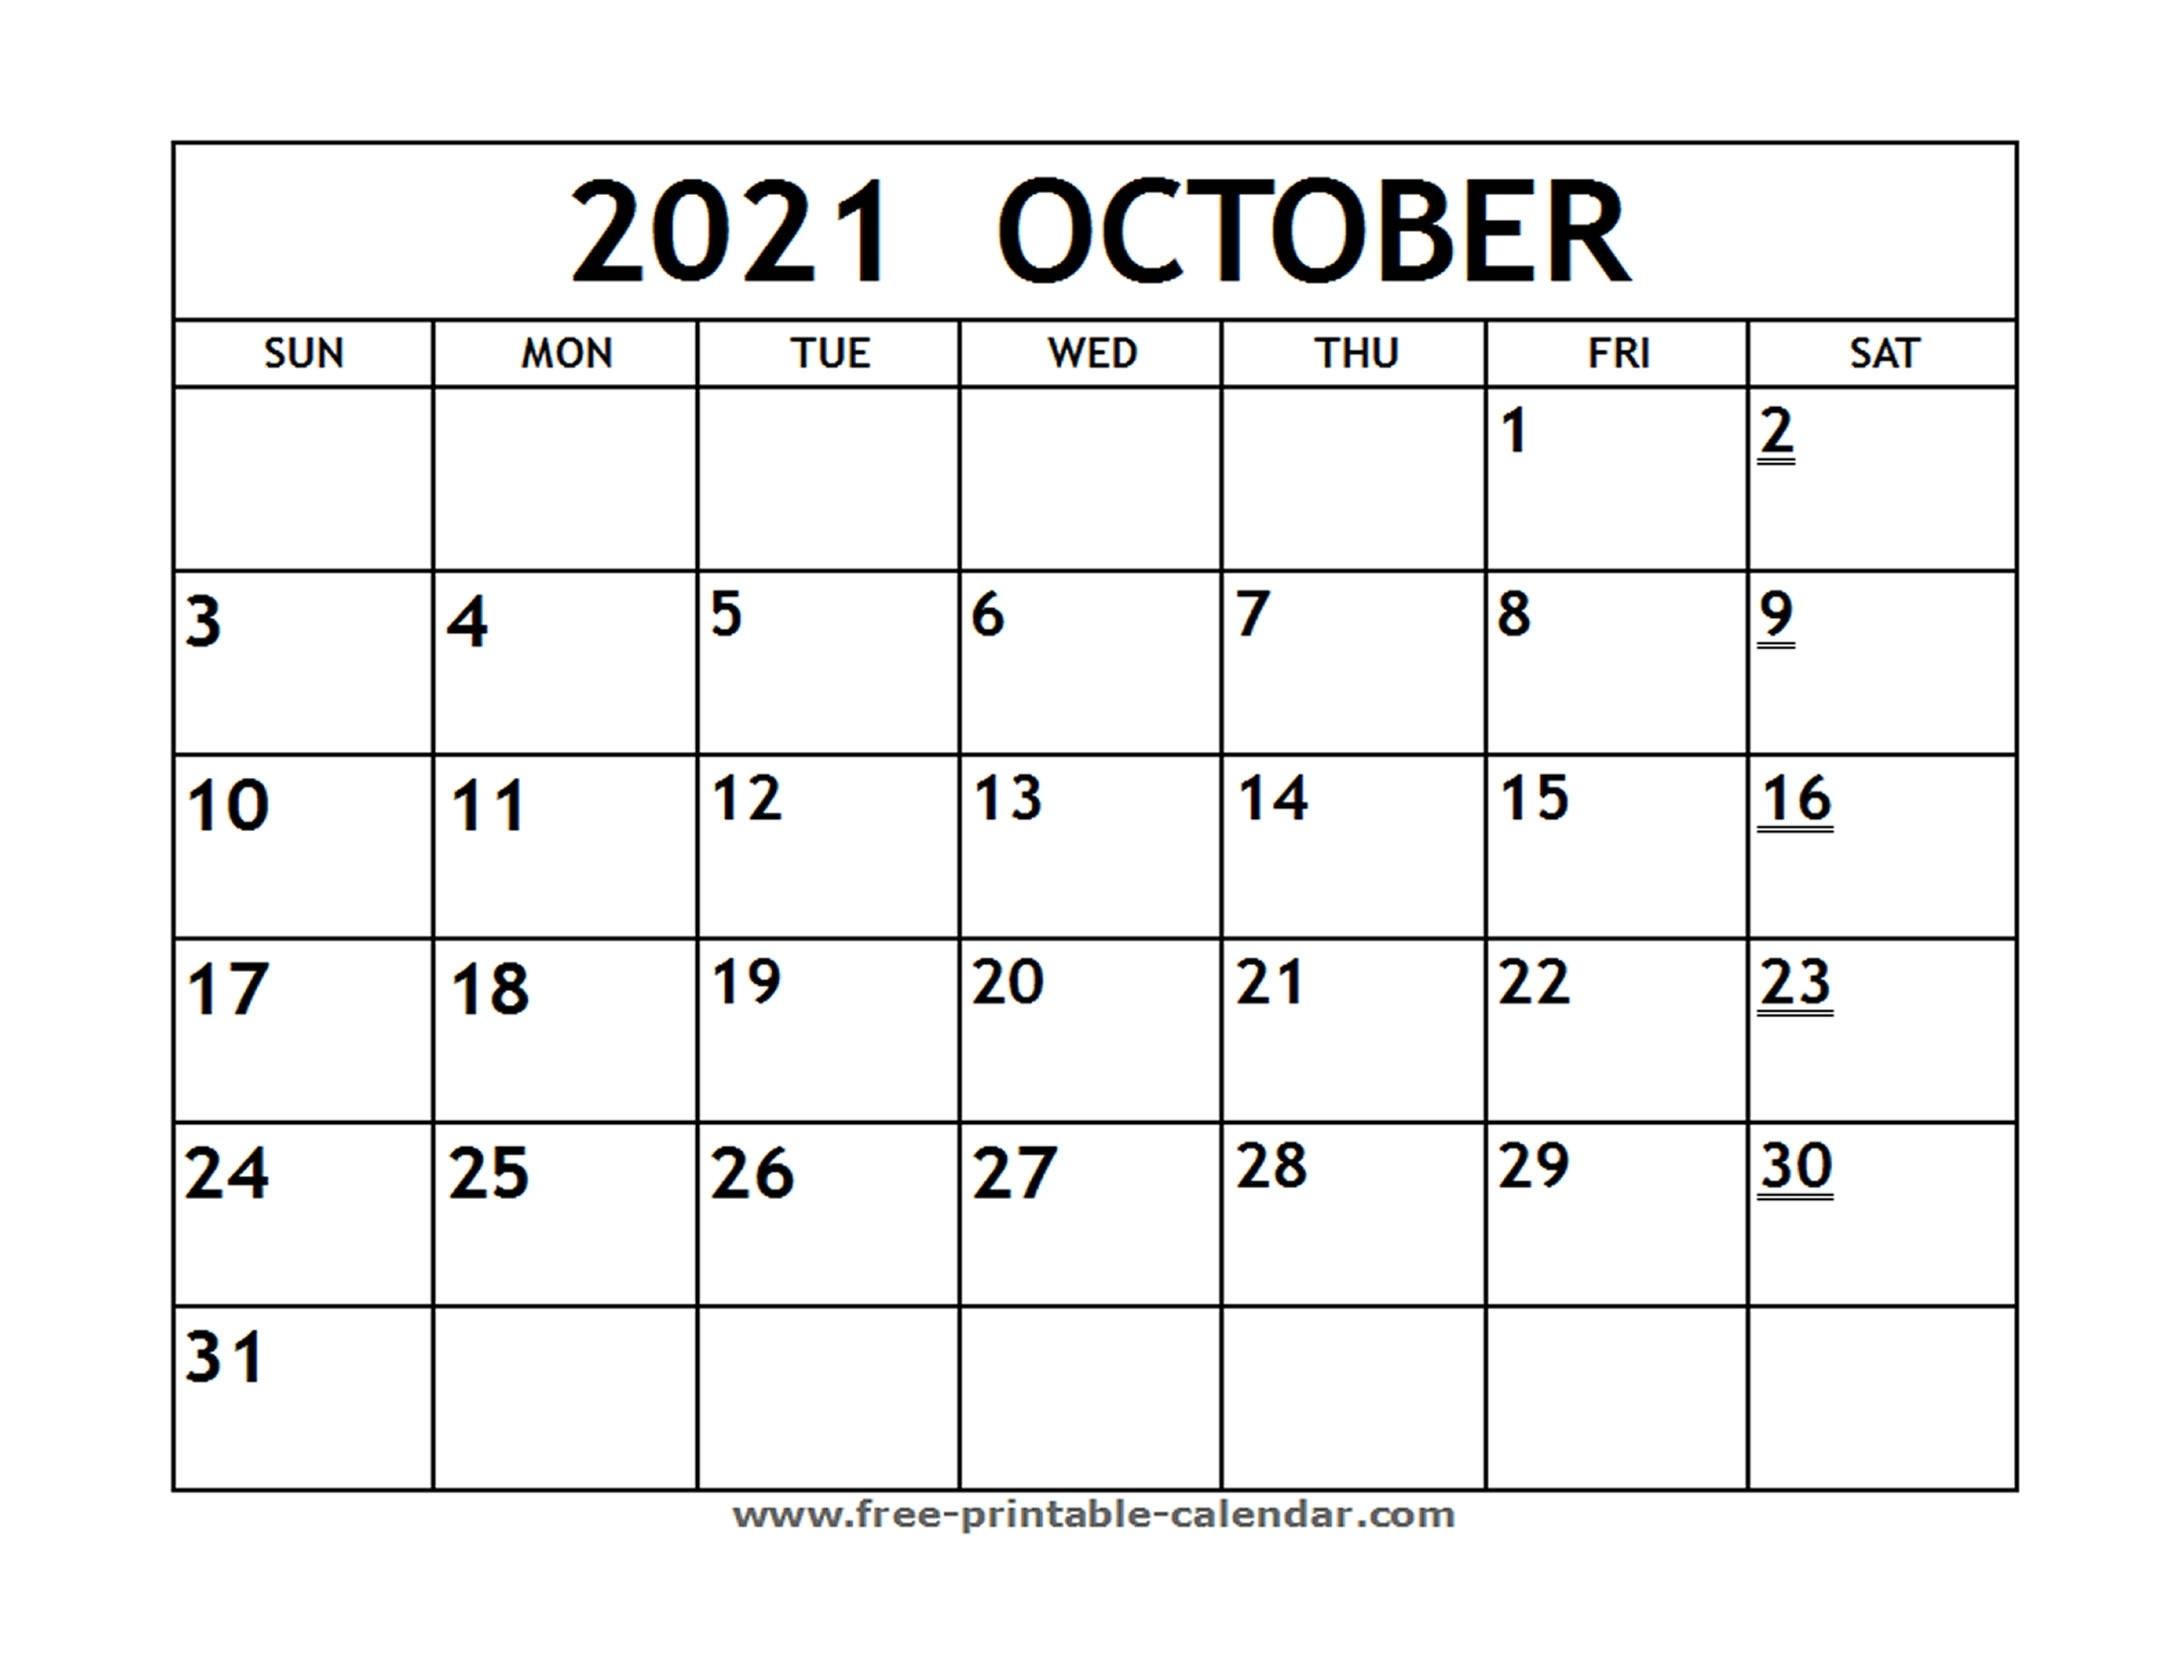 Printable 2021 October Calendar - Free-Printable-Calendar October 2021 Calendar To Print